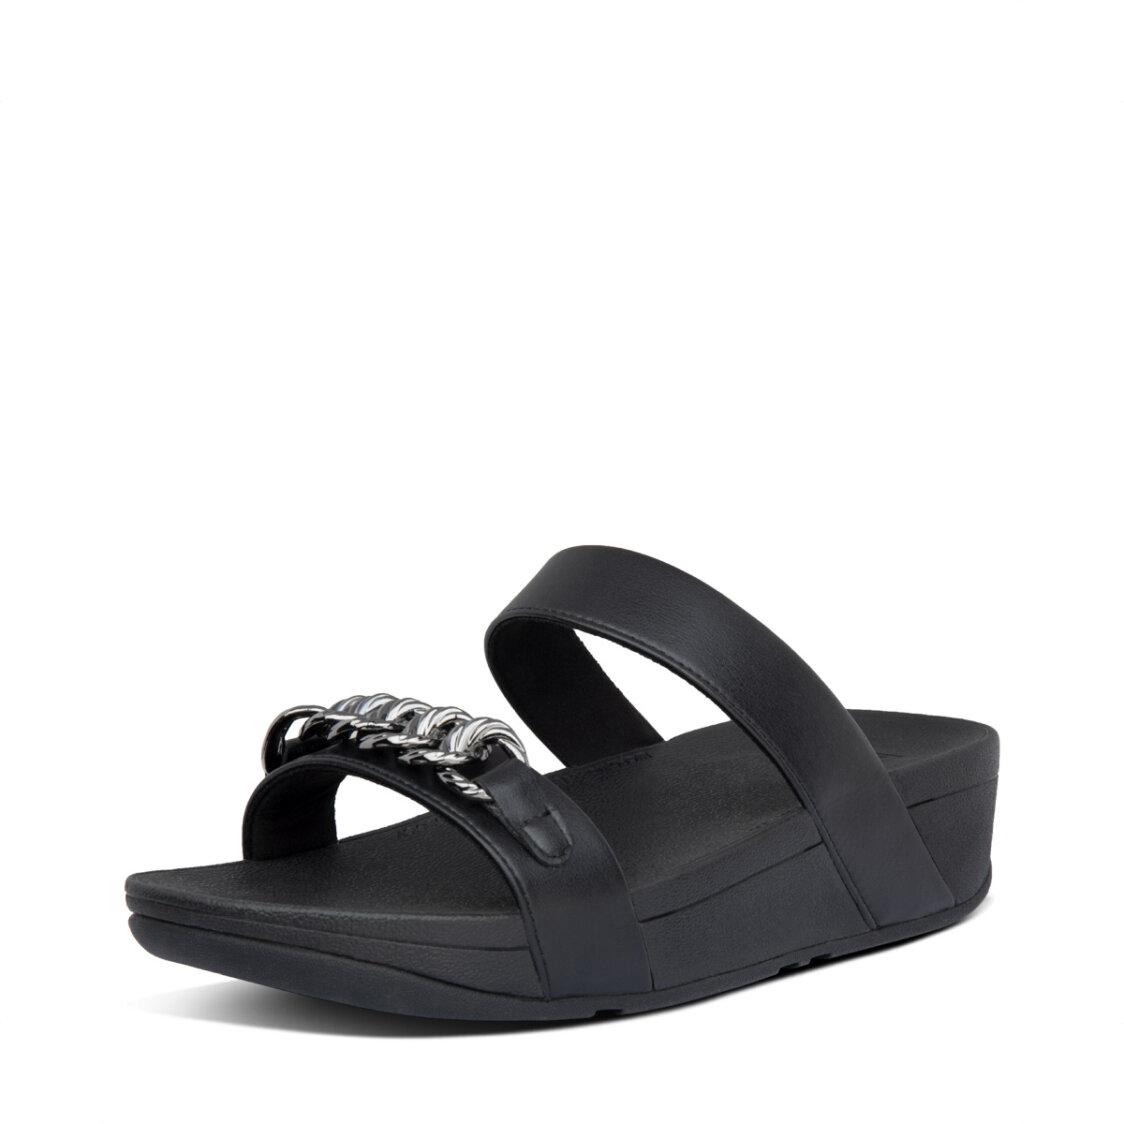 Fitflop Lottie Chain Slides All Black